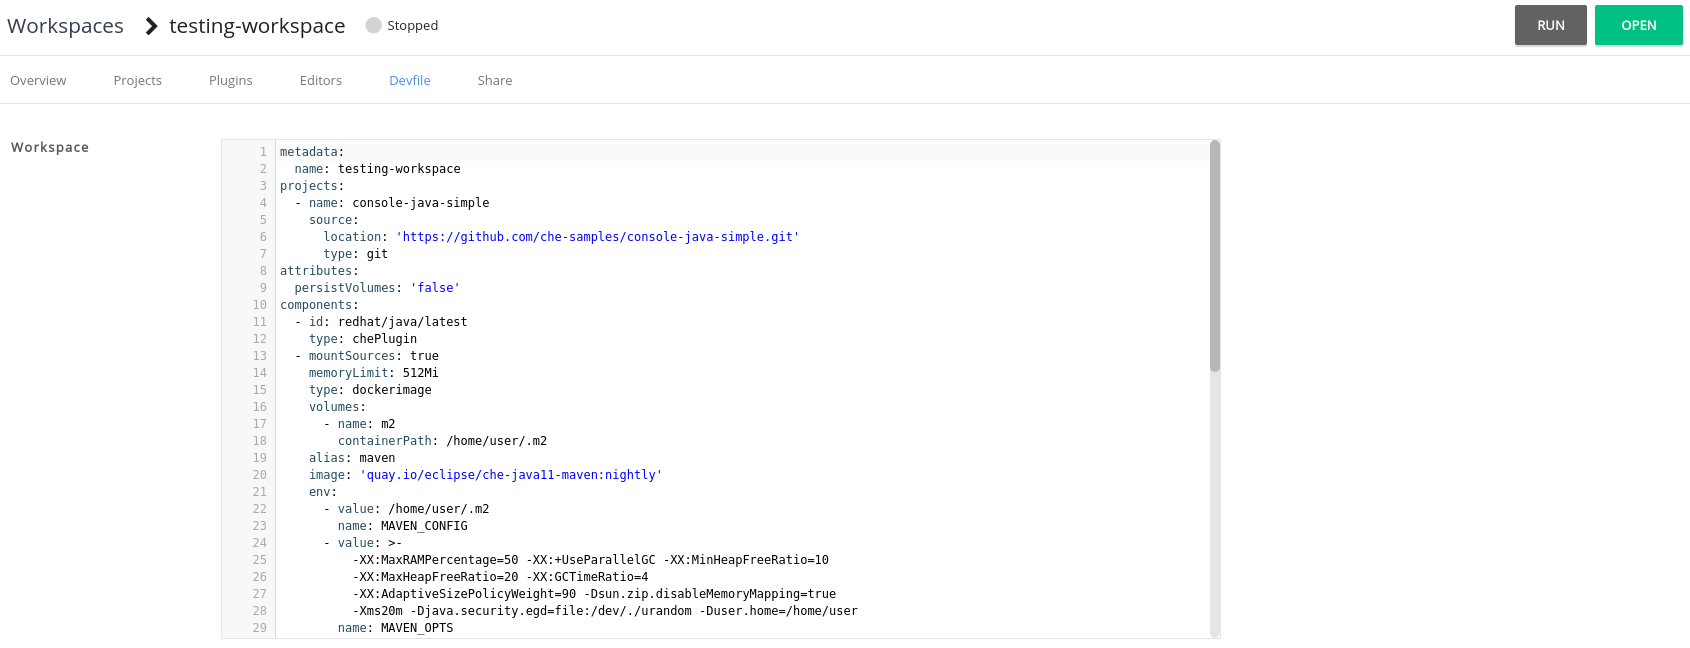 update devfile configuration